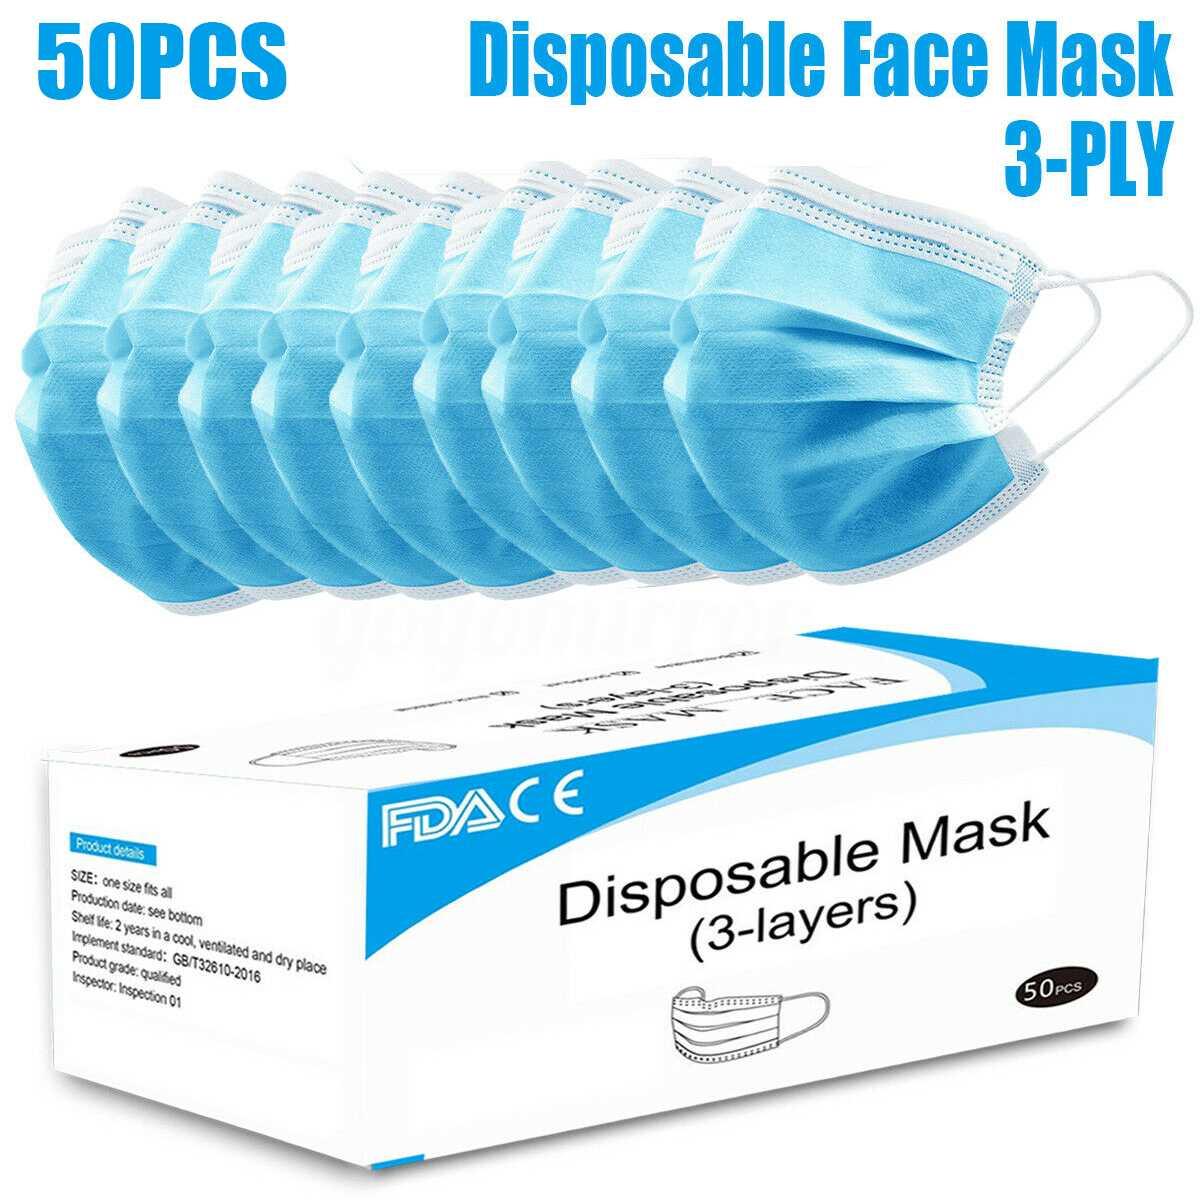 100 pcs disposable ear loop face masks